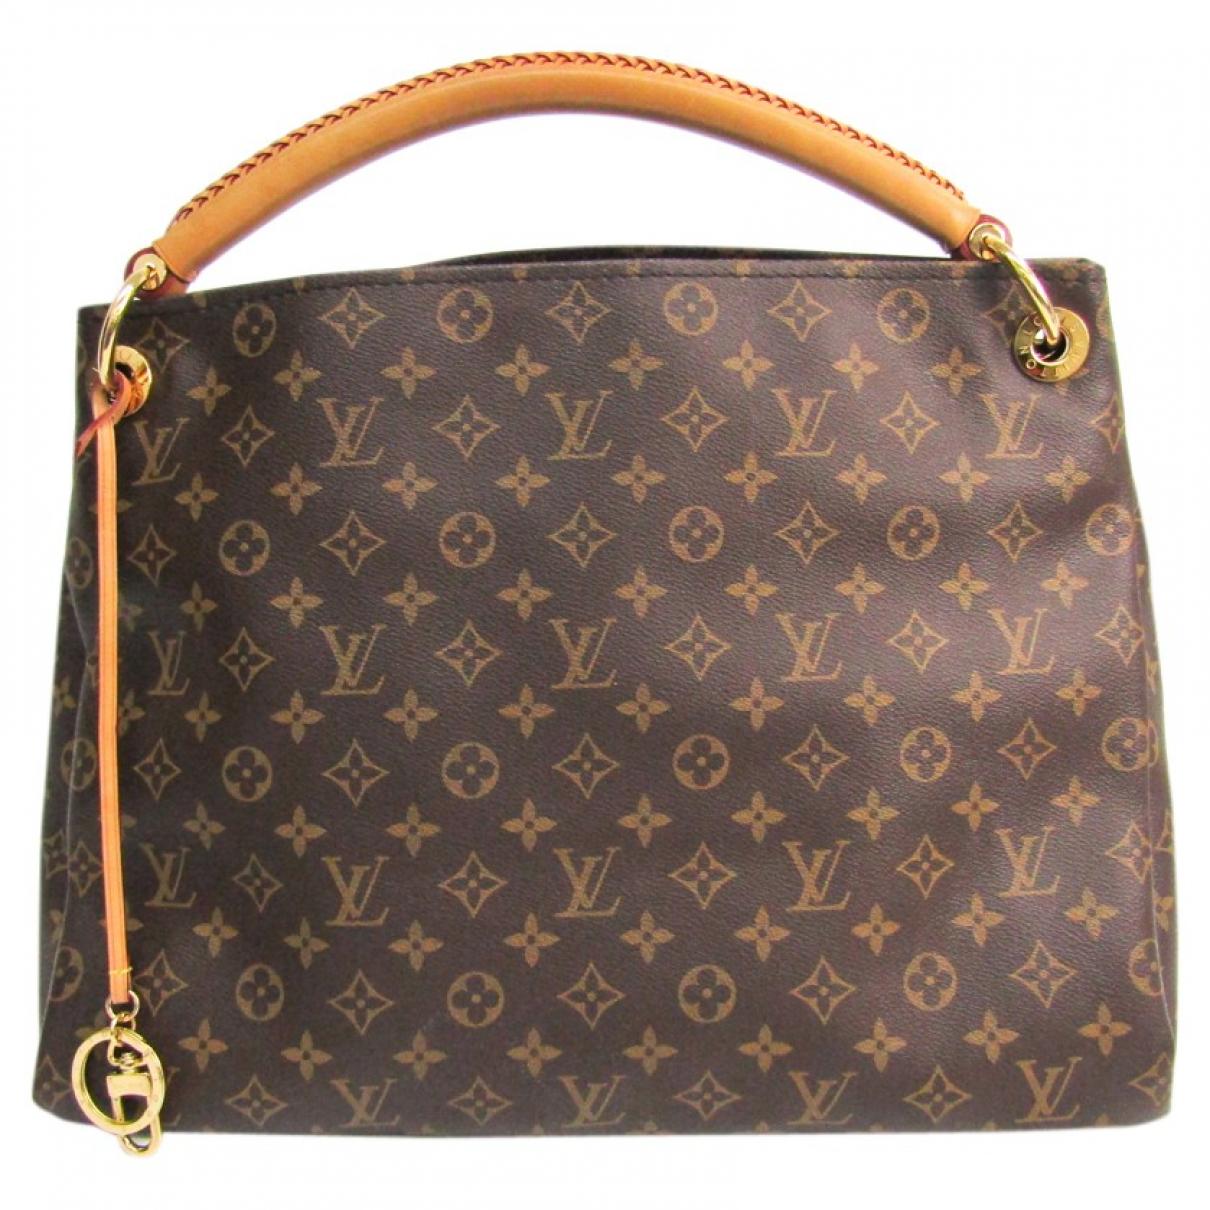 Louis Vuitton Artsy Brown Cloth handbag for Women N